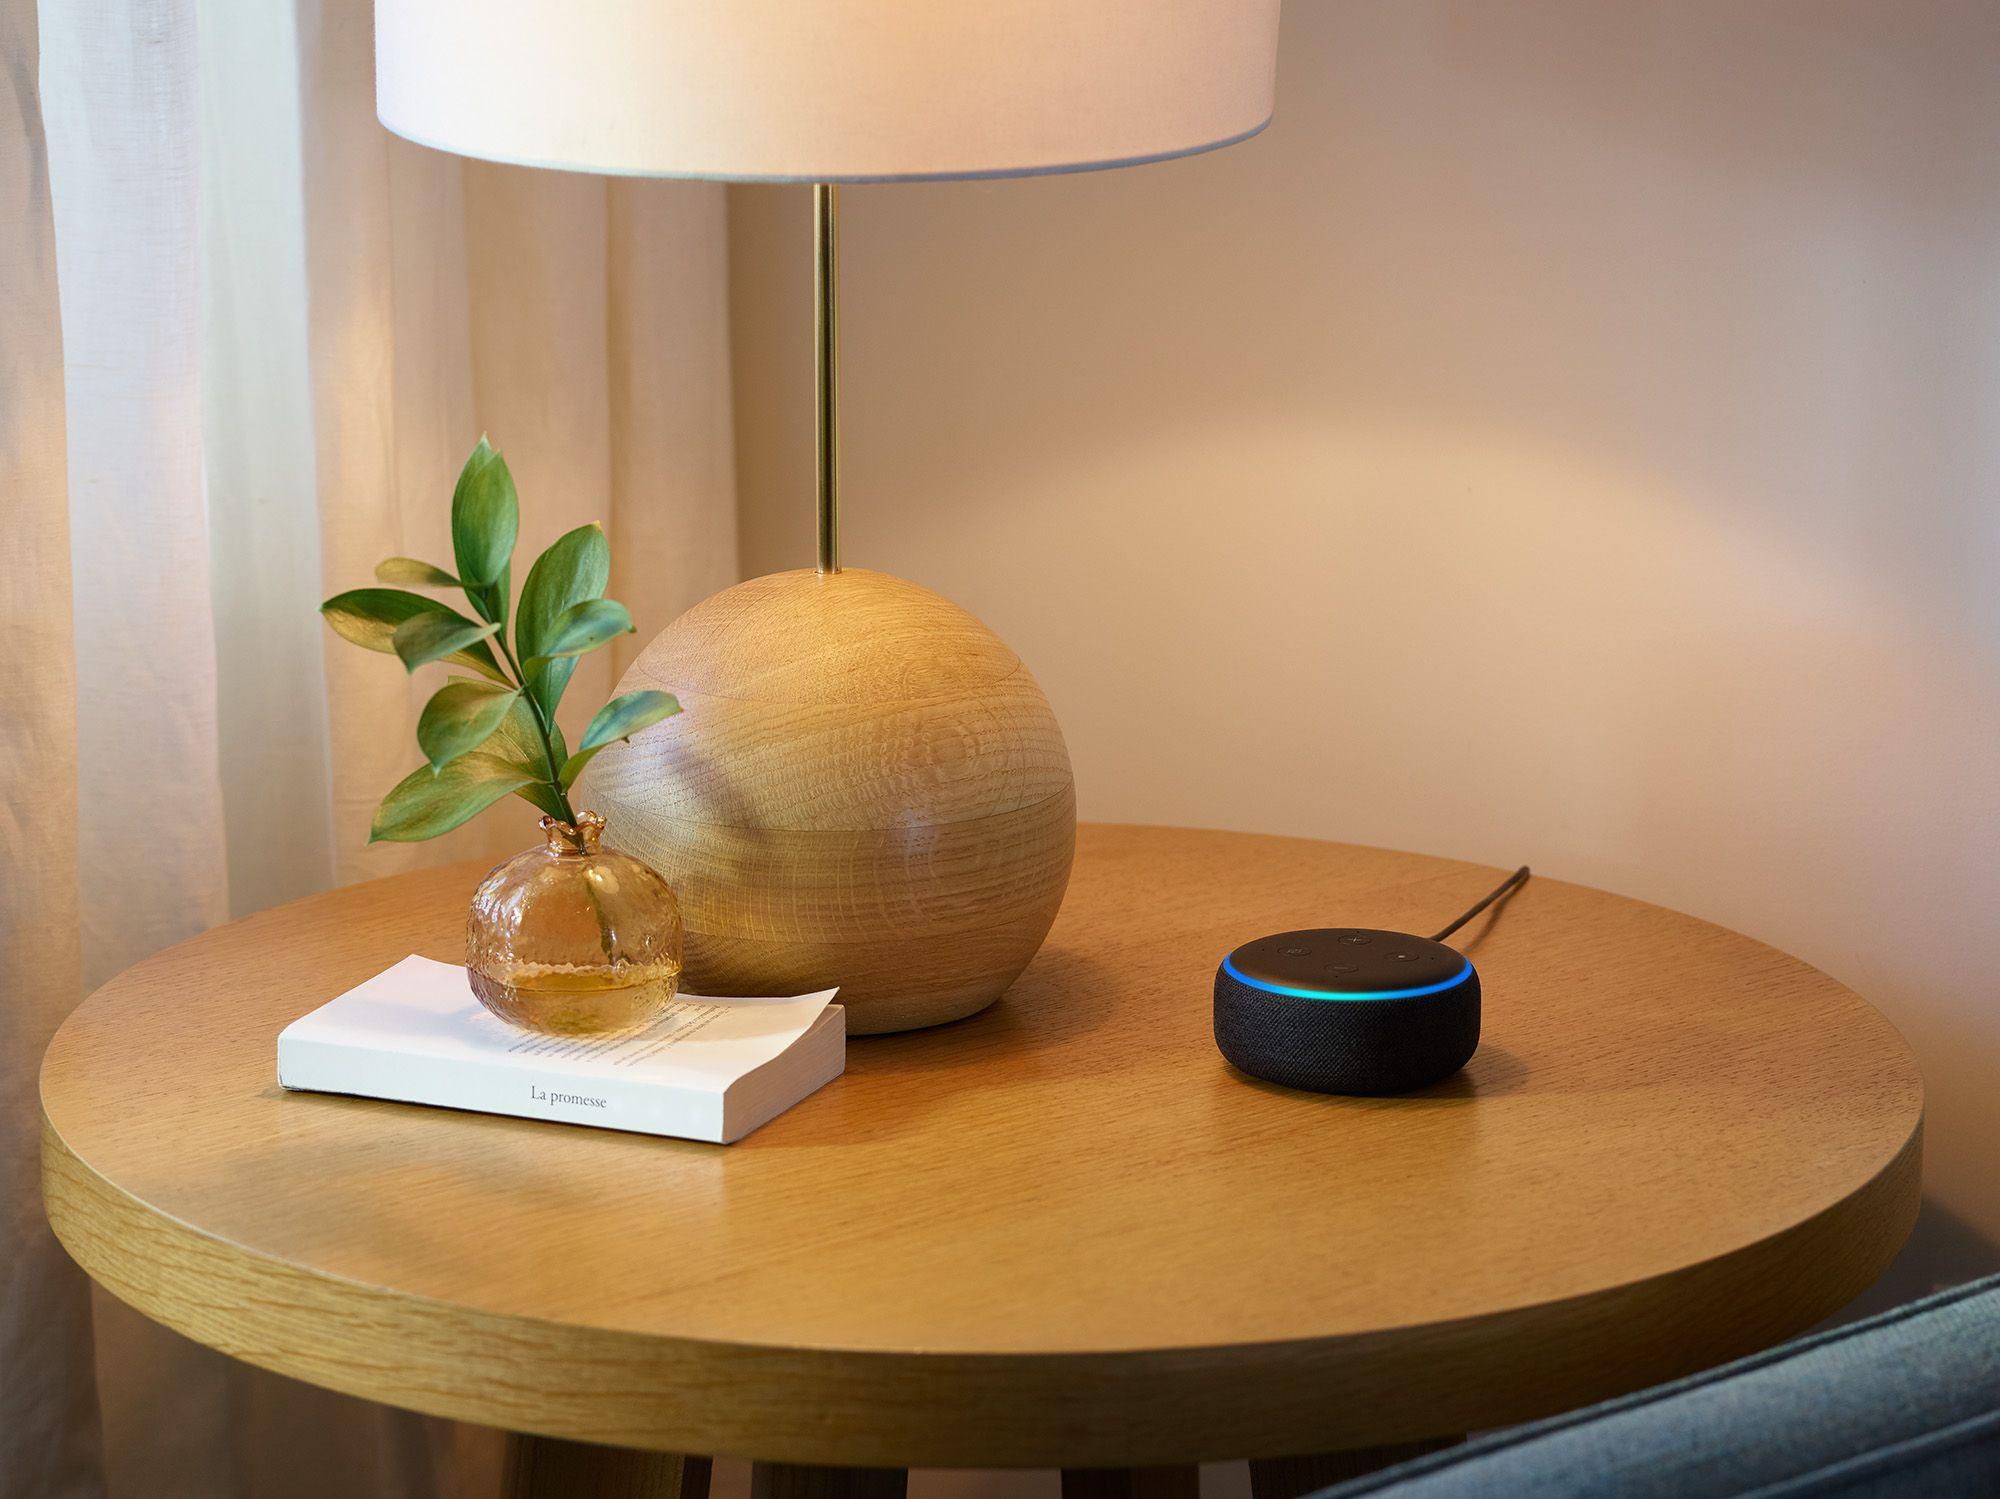 Amazon Echo Dot, Charcoal, Emirates NBD